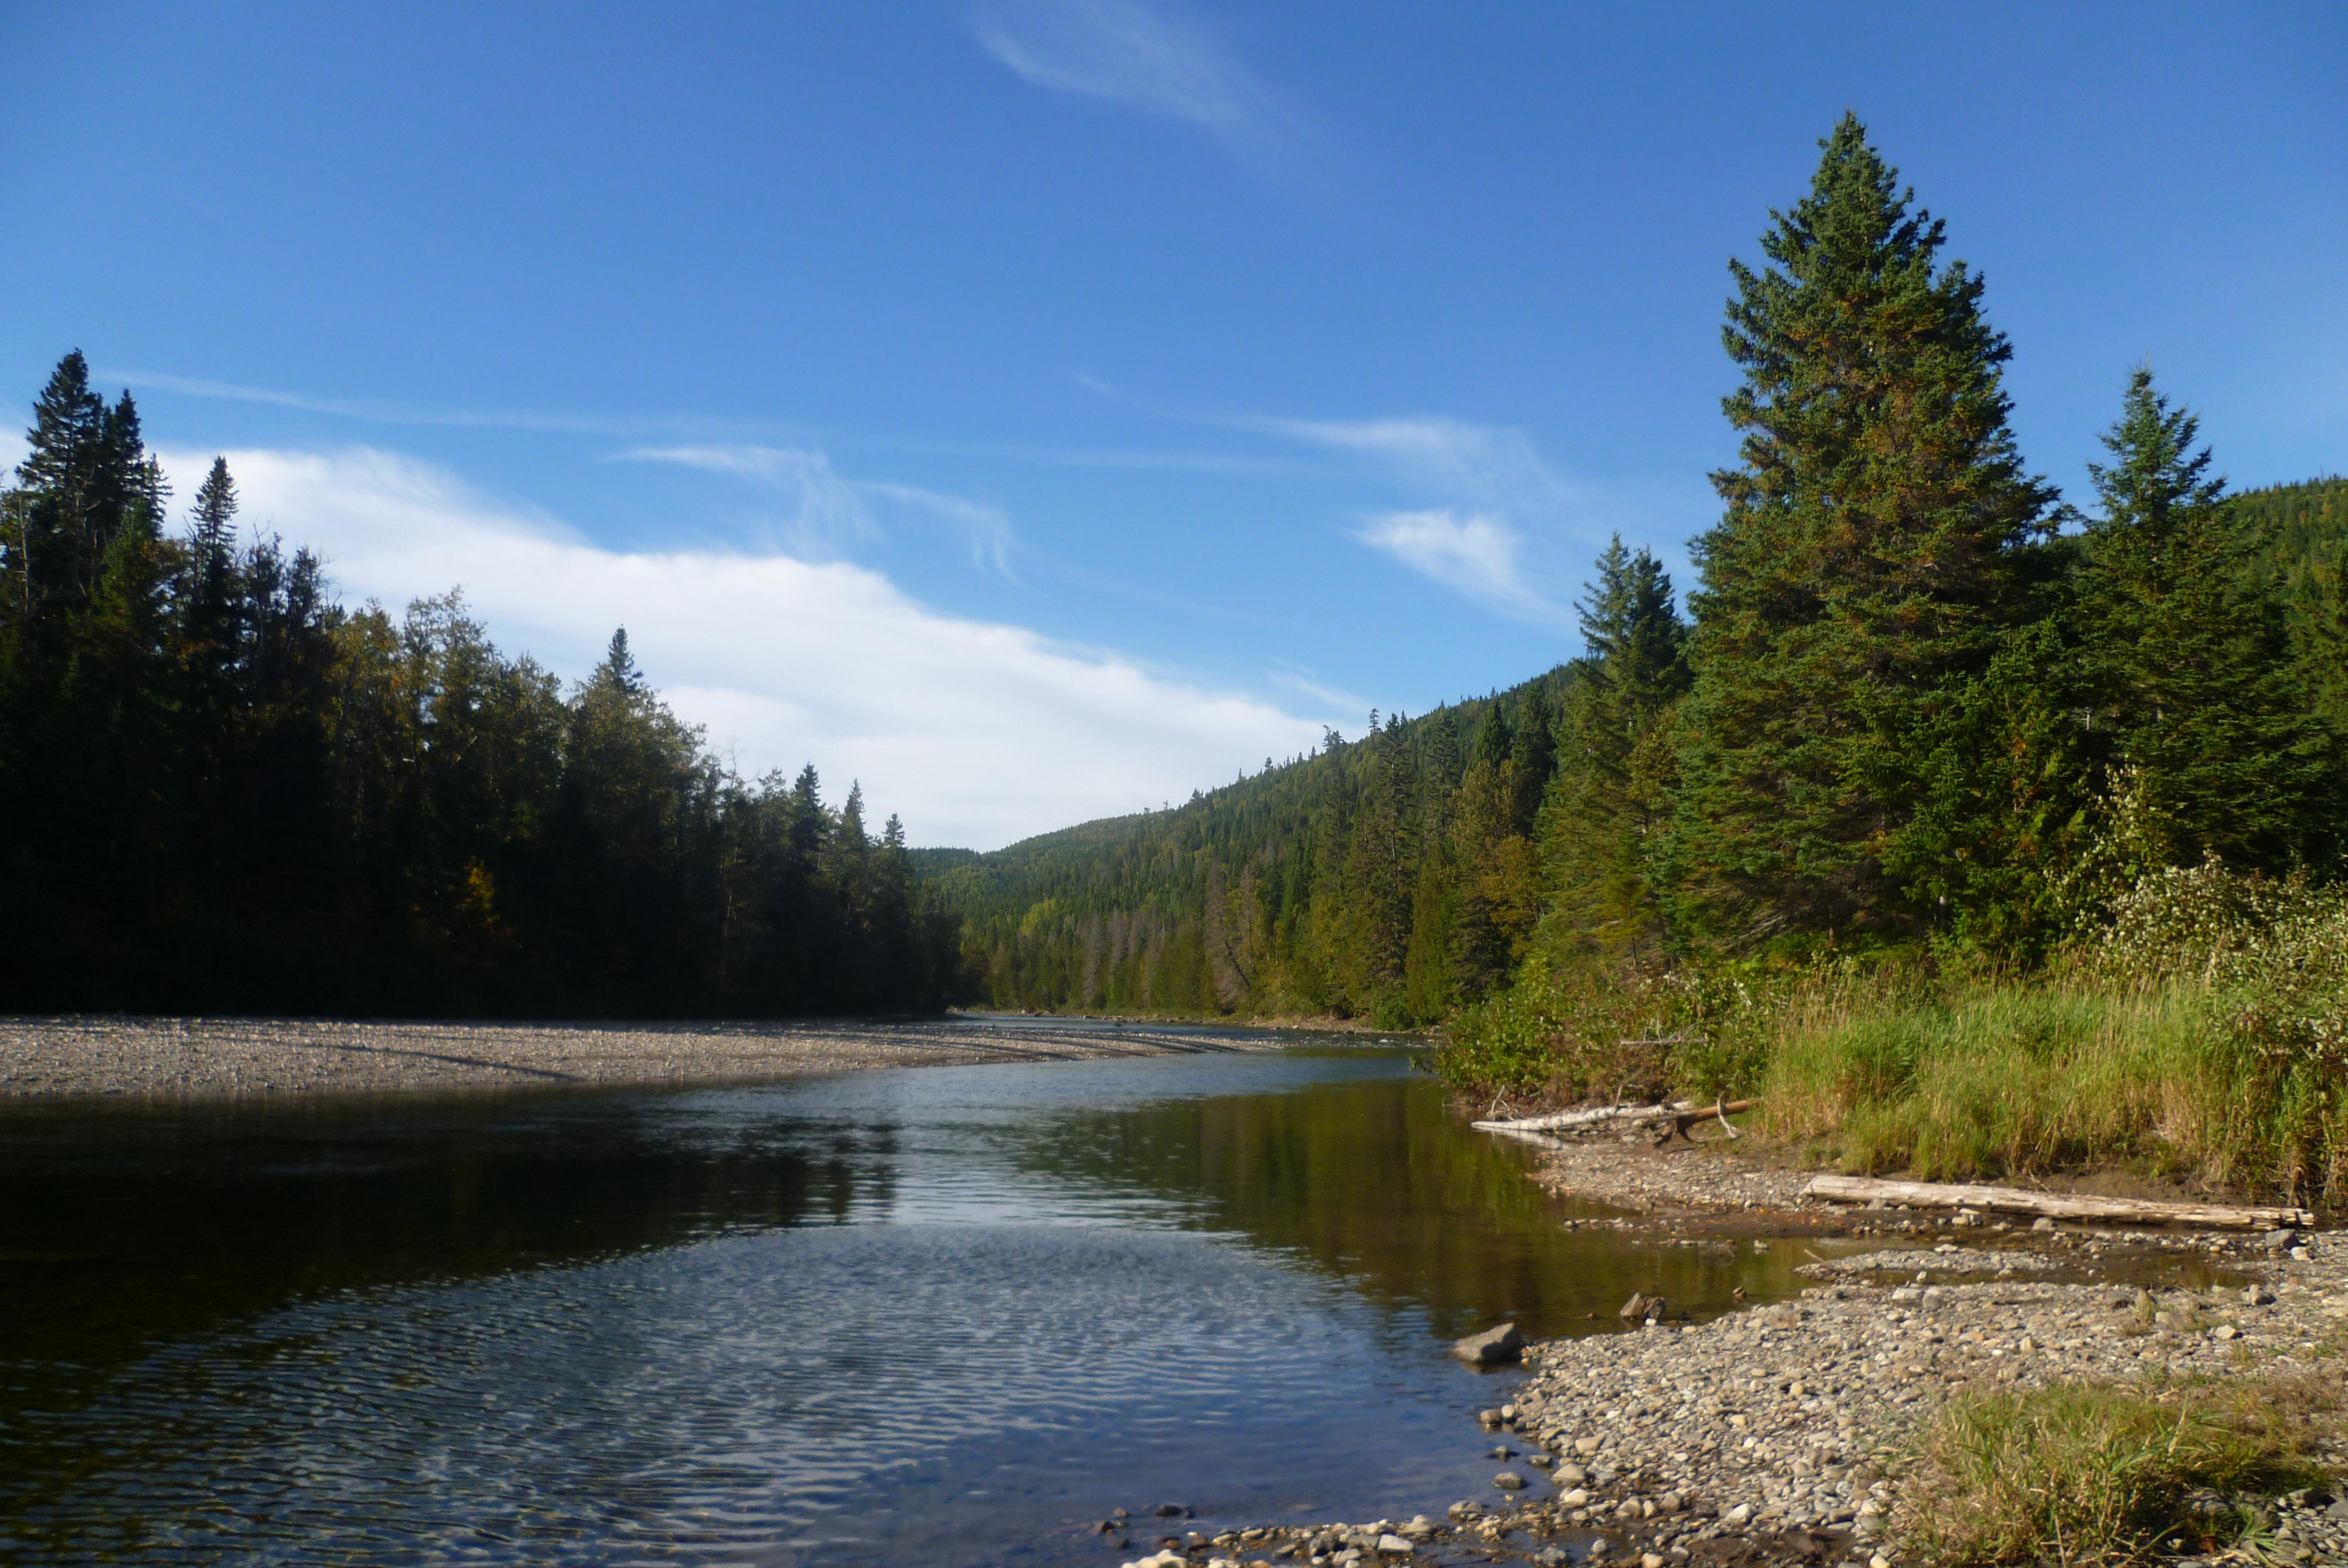 01-riviere-darmouth-gaspesie-acadie